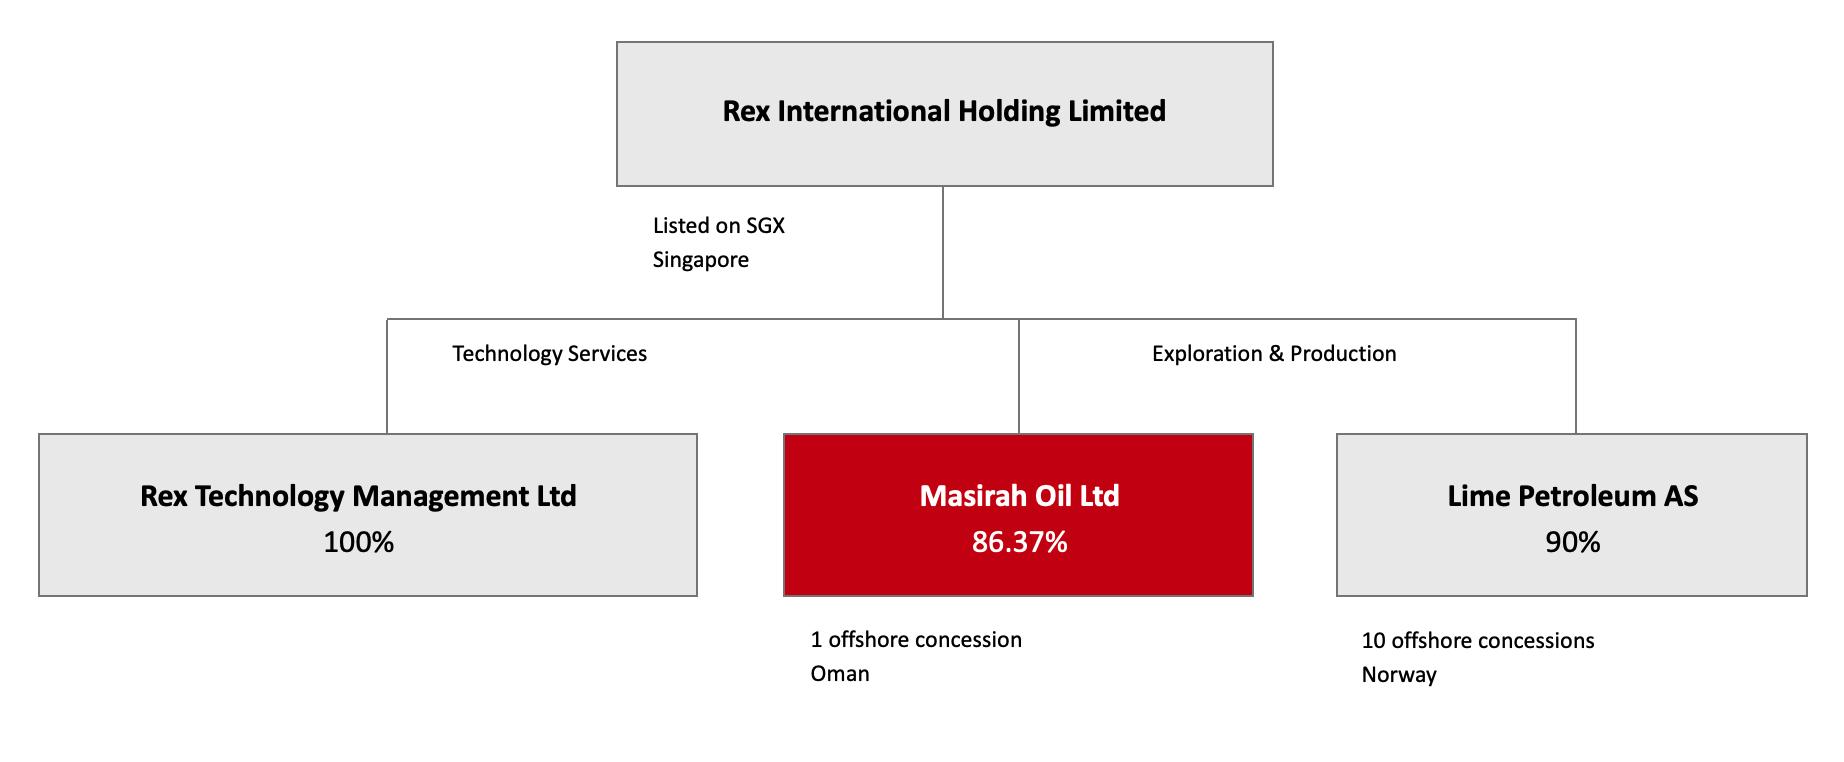 Masirah Oil Organisation Chart